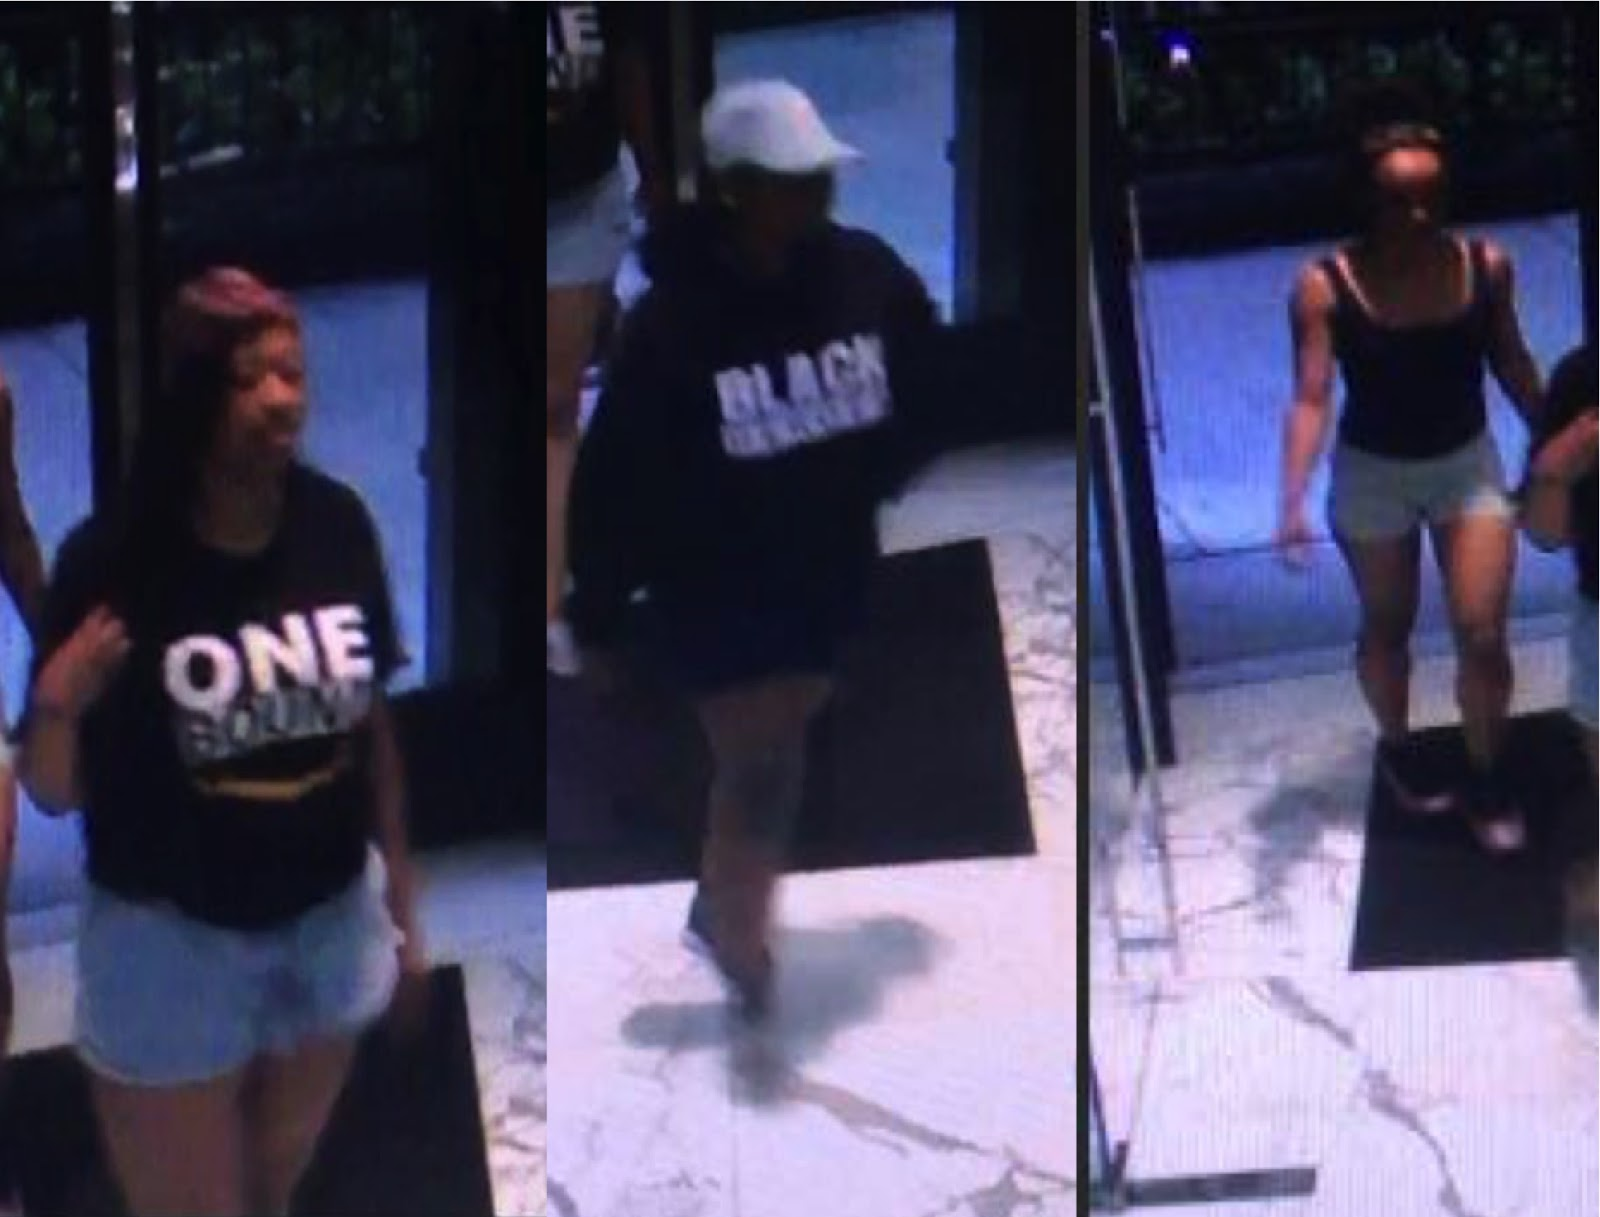 3c07b1e87a0 CWB Chicago: Cops Seek Trio That Robbed YSL, Attacked Guard